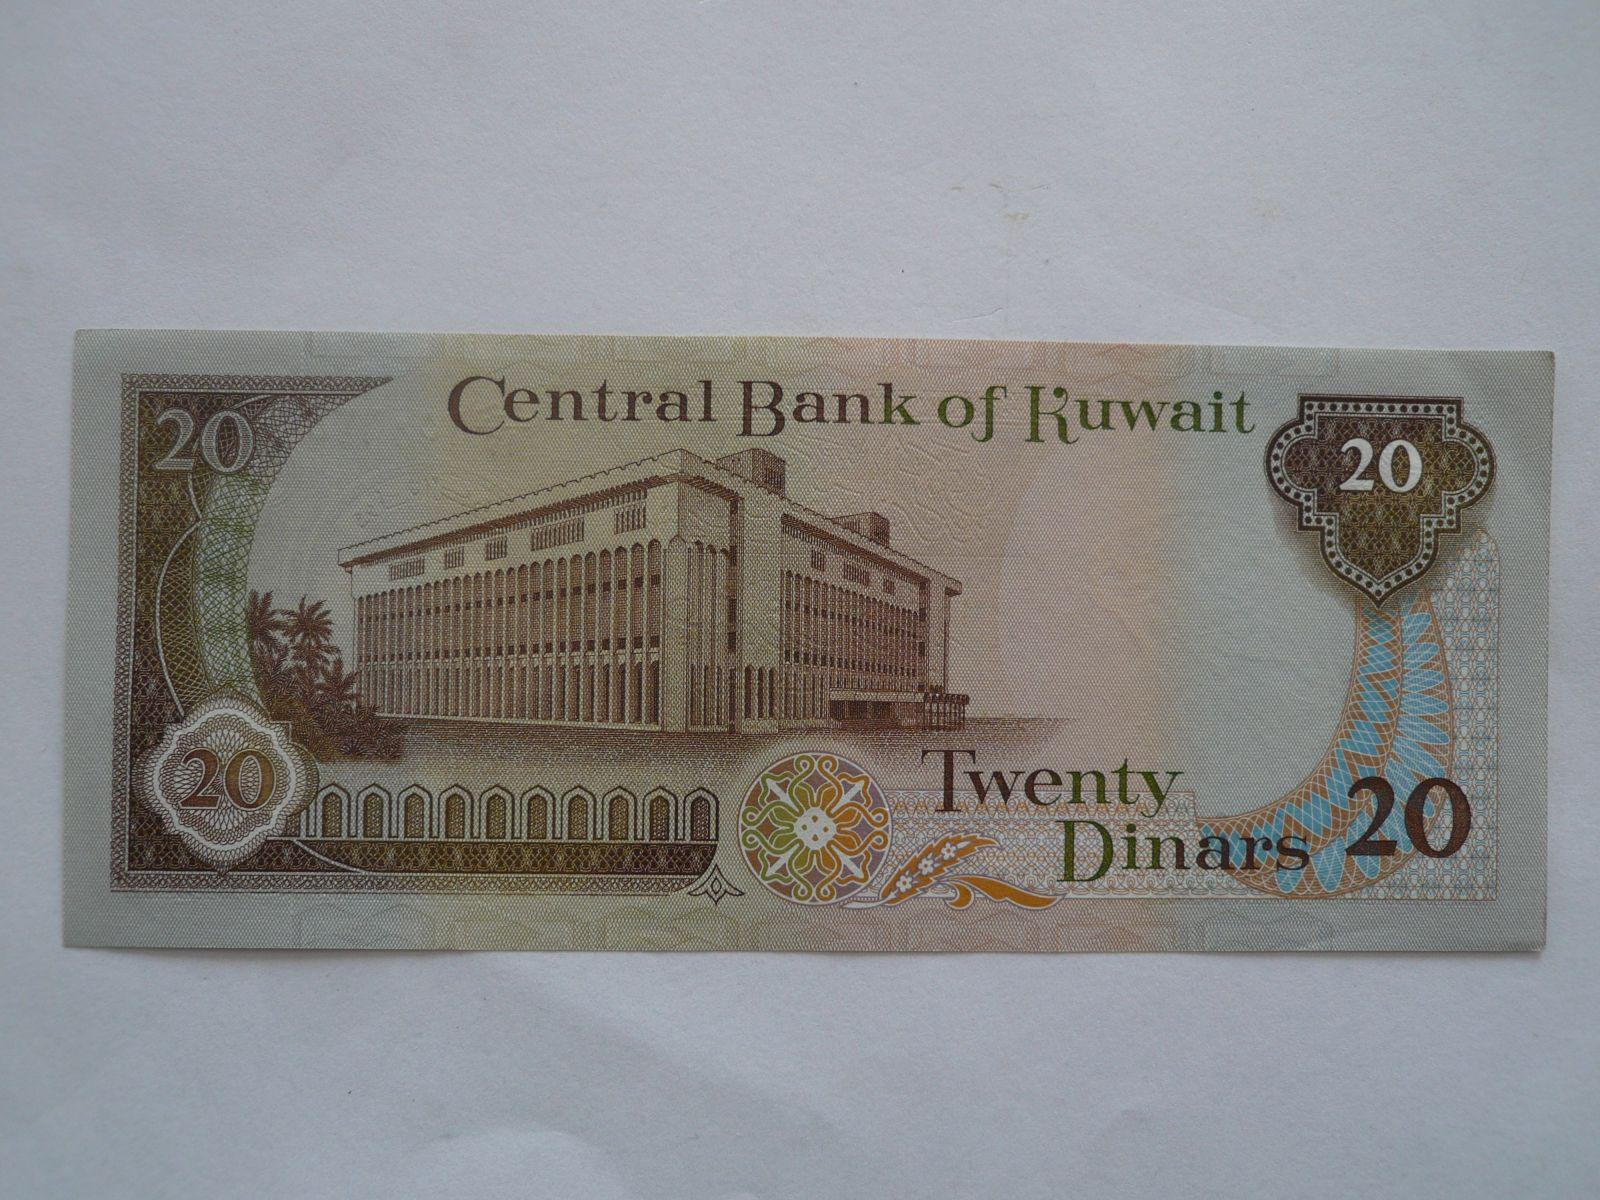 20 Dinars, Kuvajt, hnědá